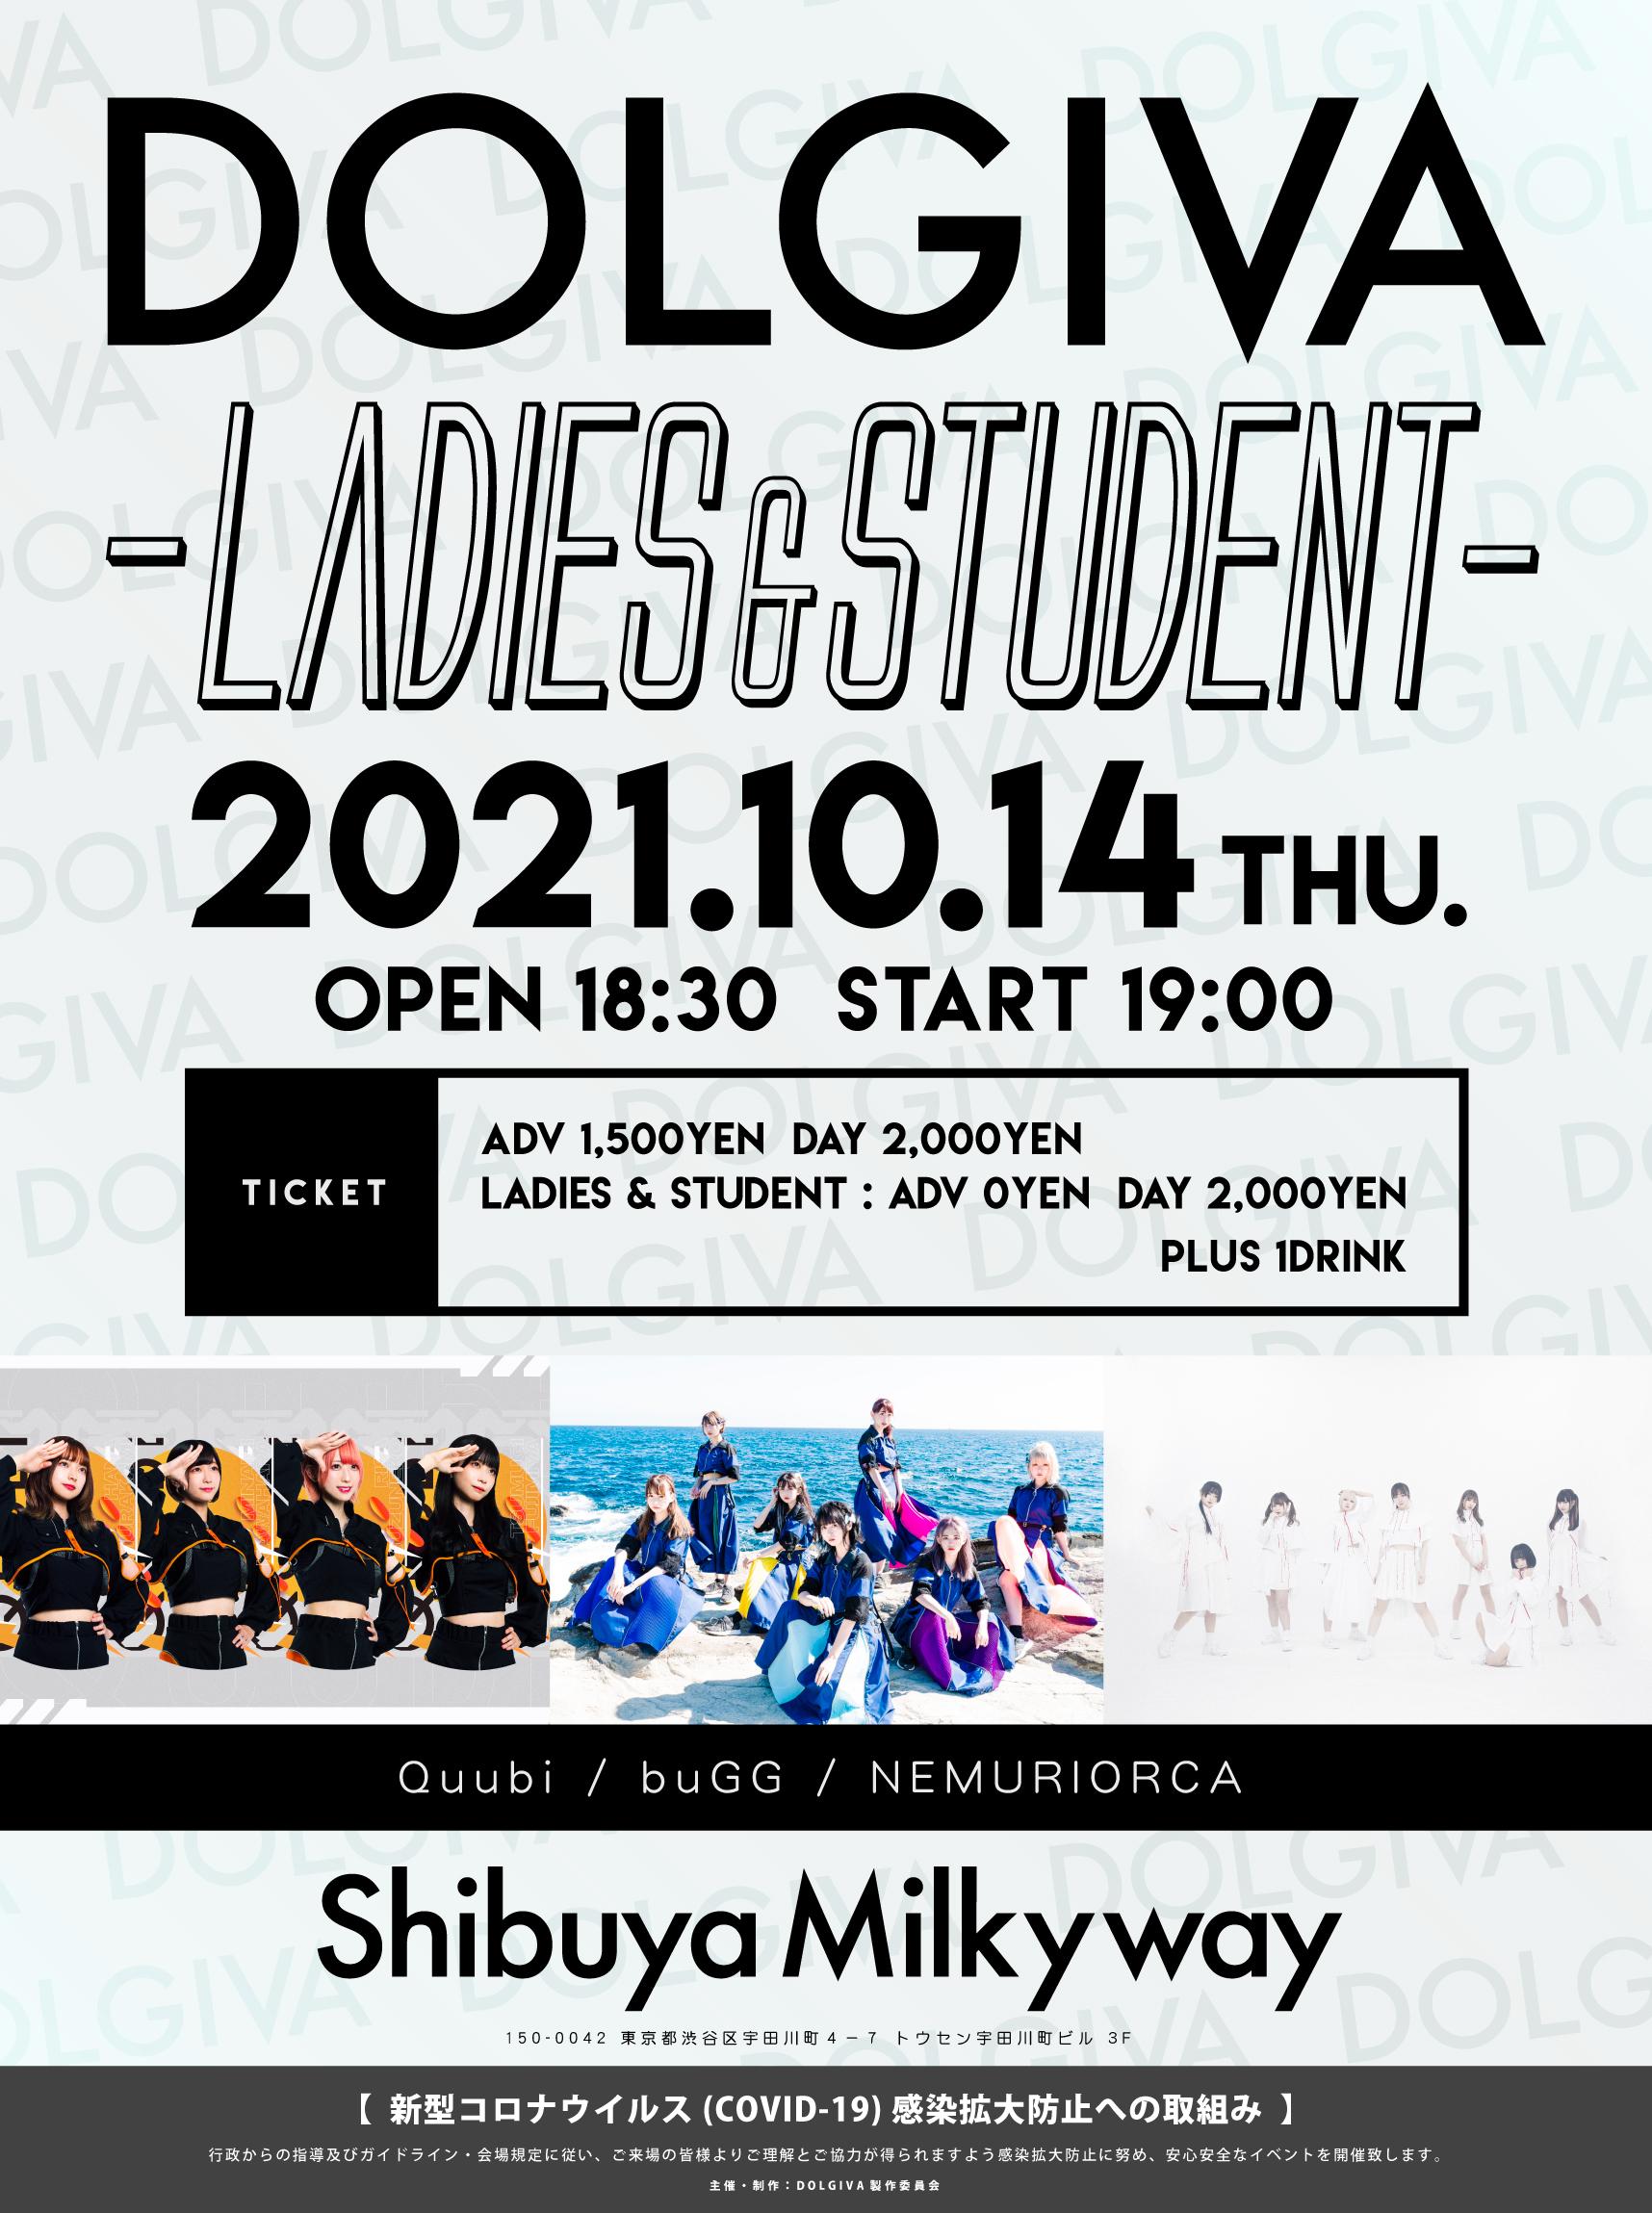 「DOLGIVA - ladies & student」